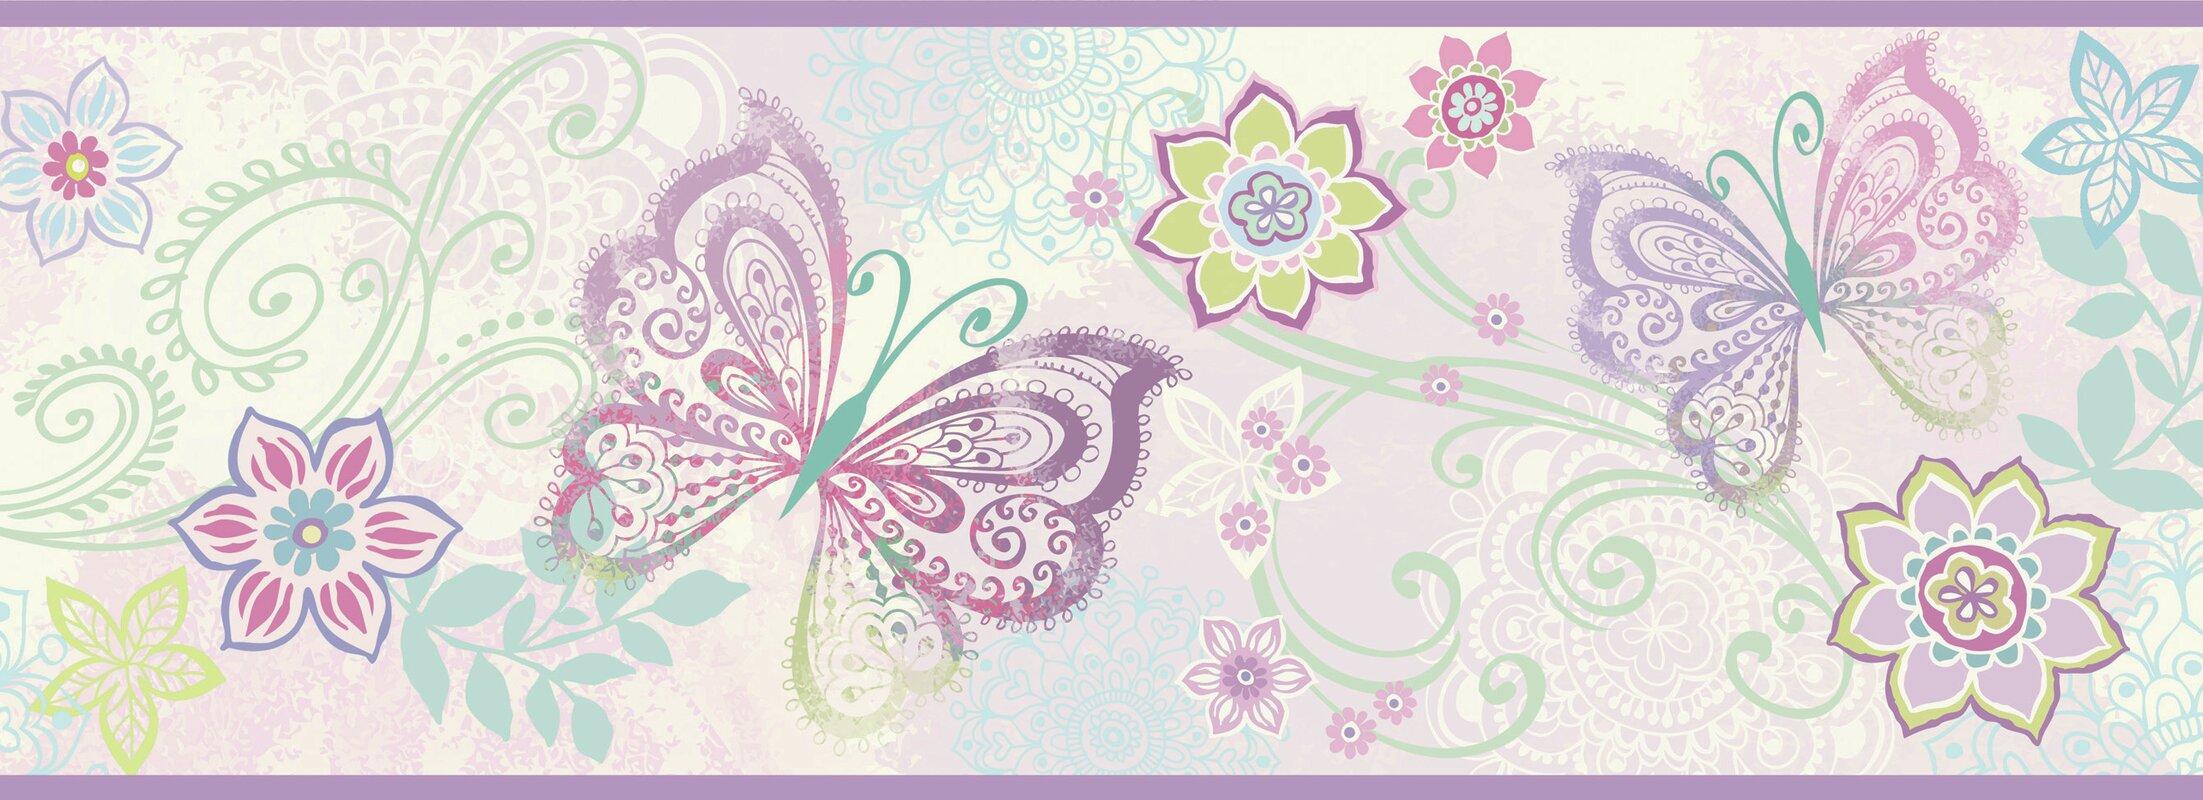 Borders By Chesapeake Fantasia Boho Butterflies 15 X 65 Floral Border Wallpaper